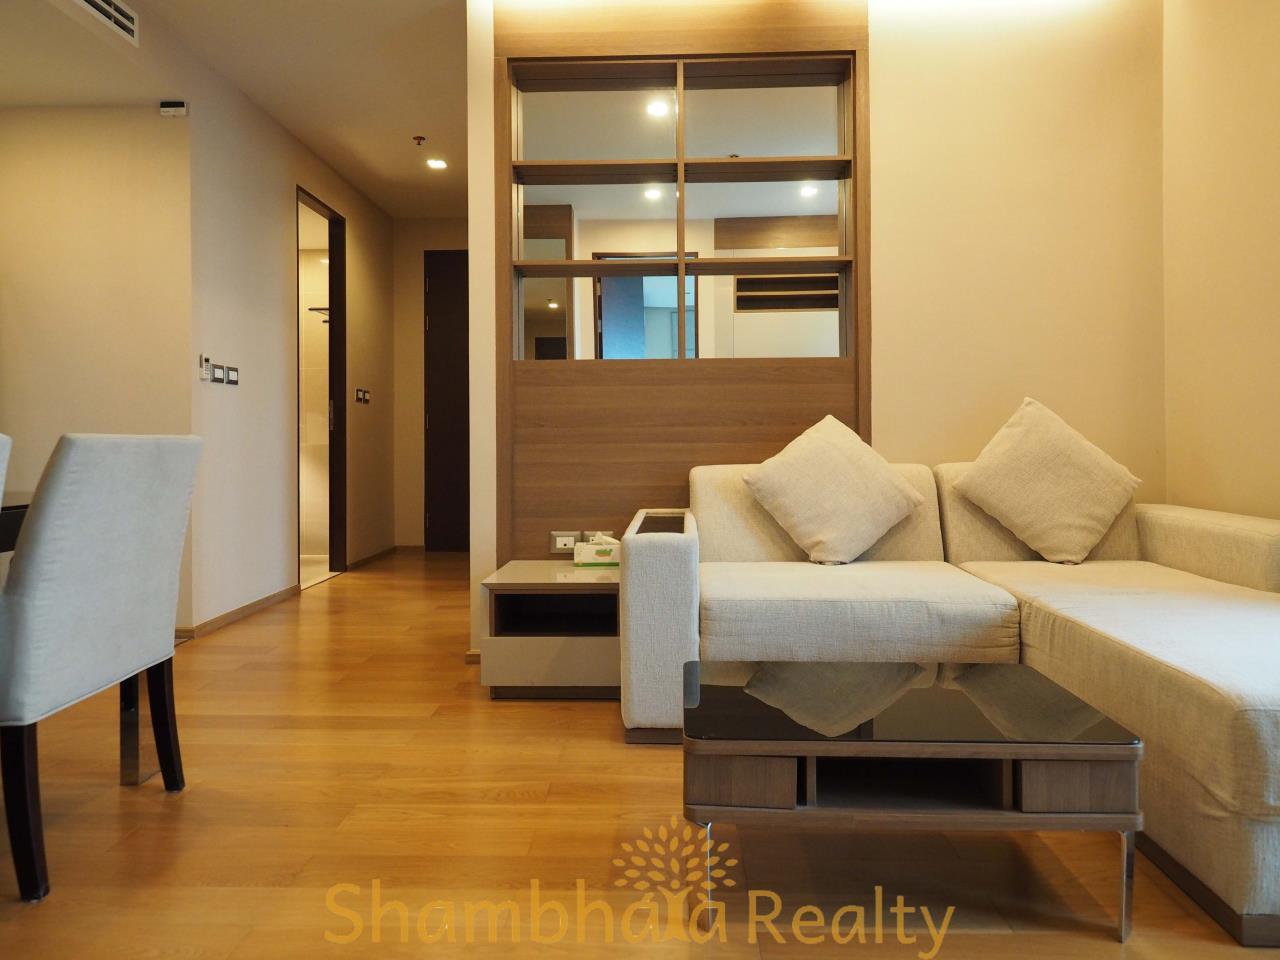 Shambhala Realty Agency's The Address Asoke Condominium for Rent in New Phetchaburi 5